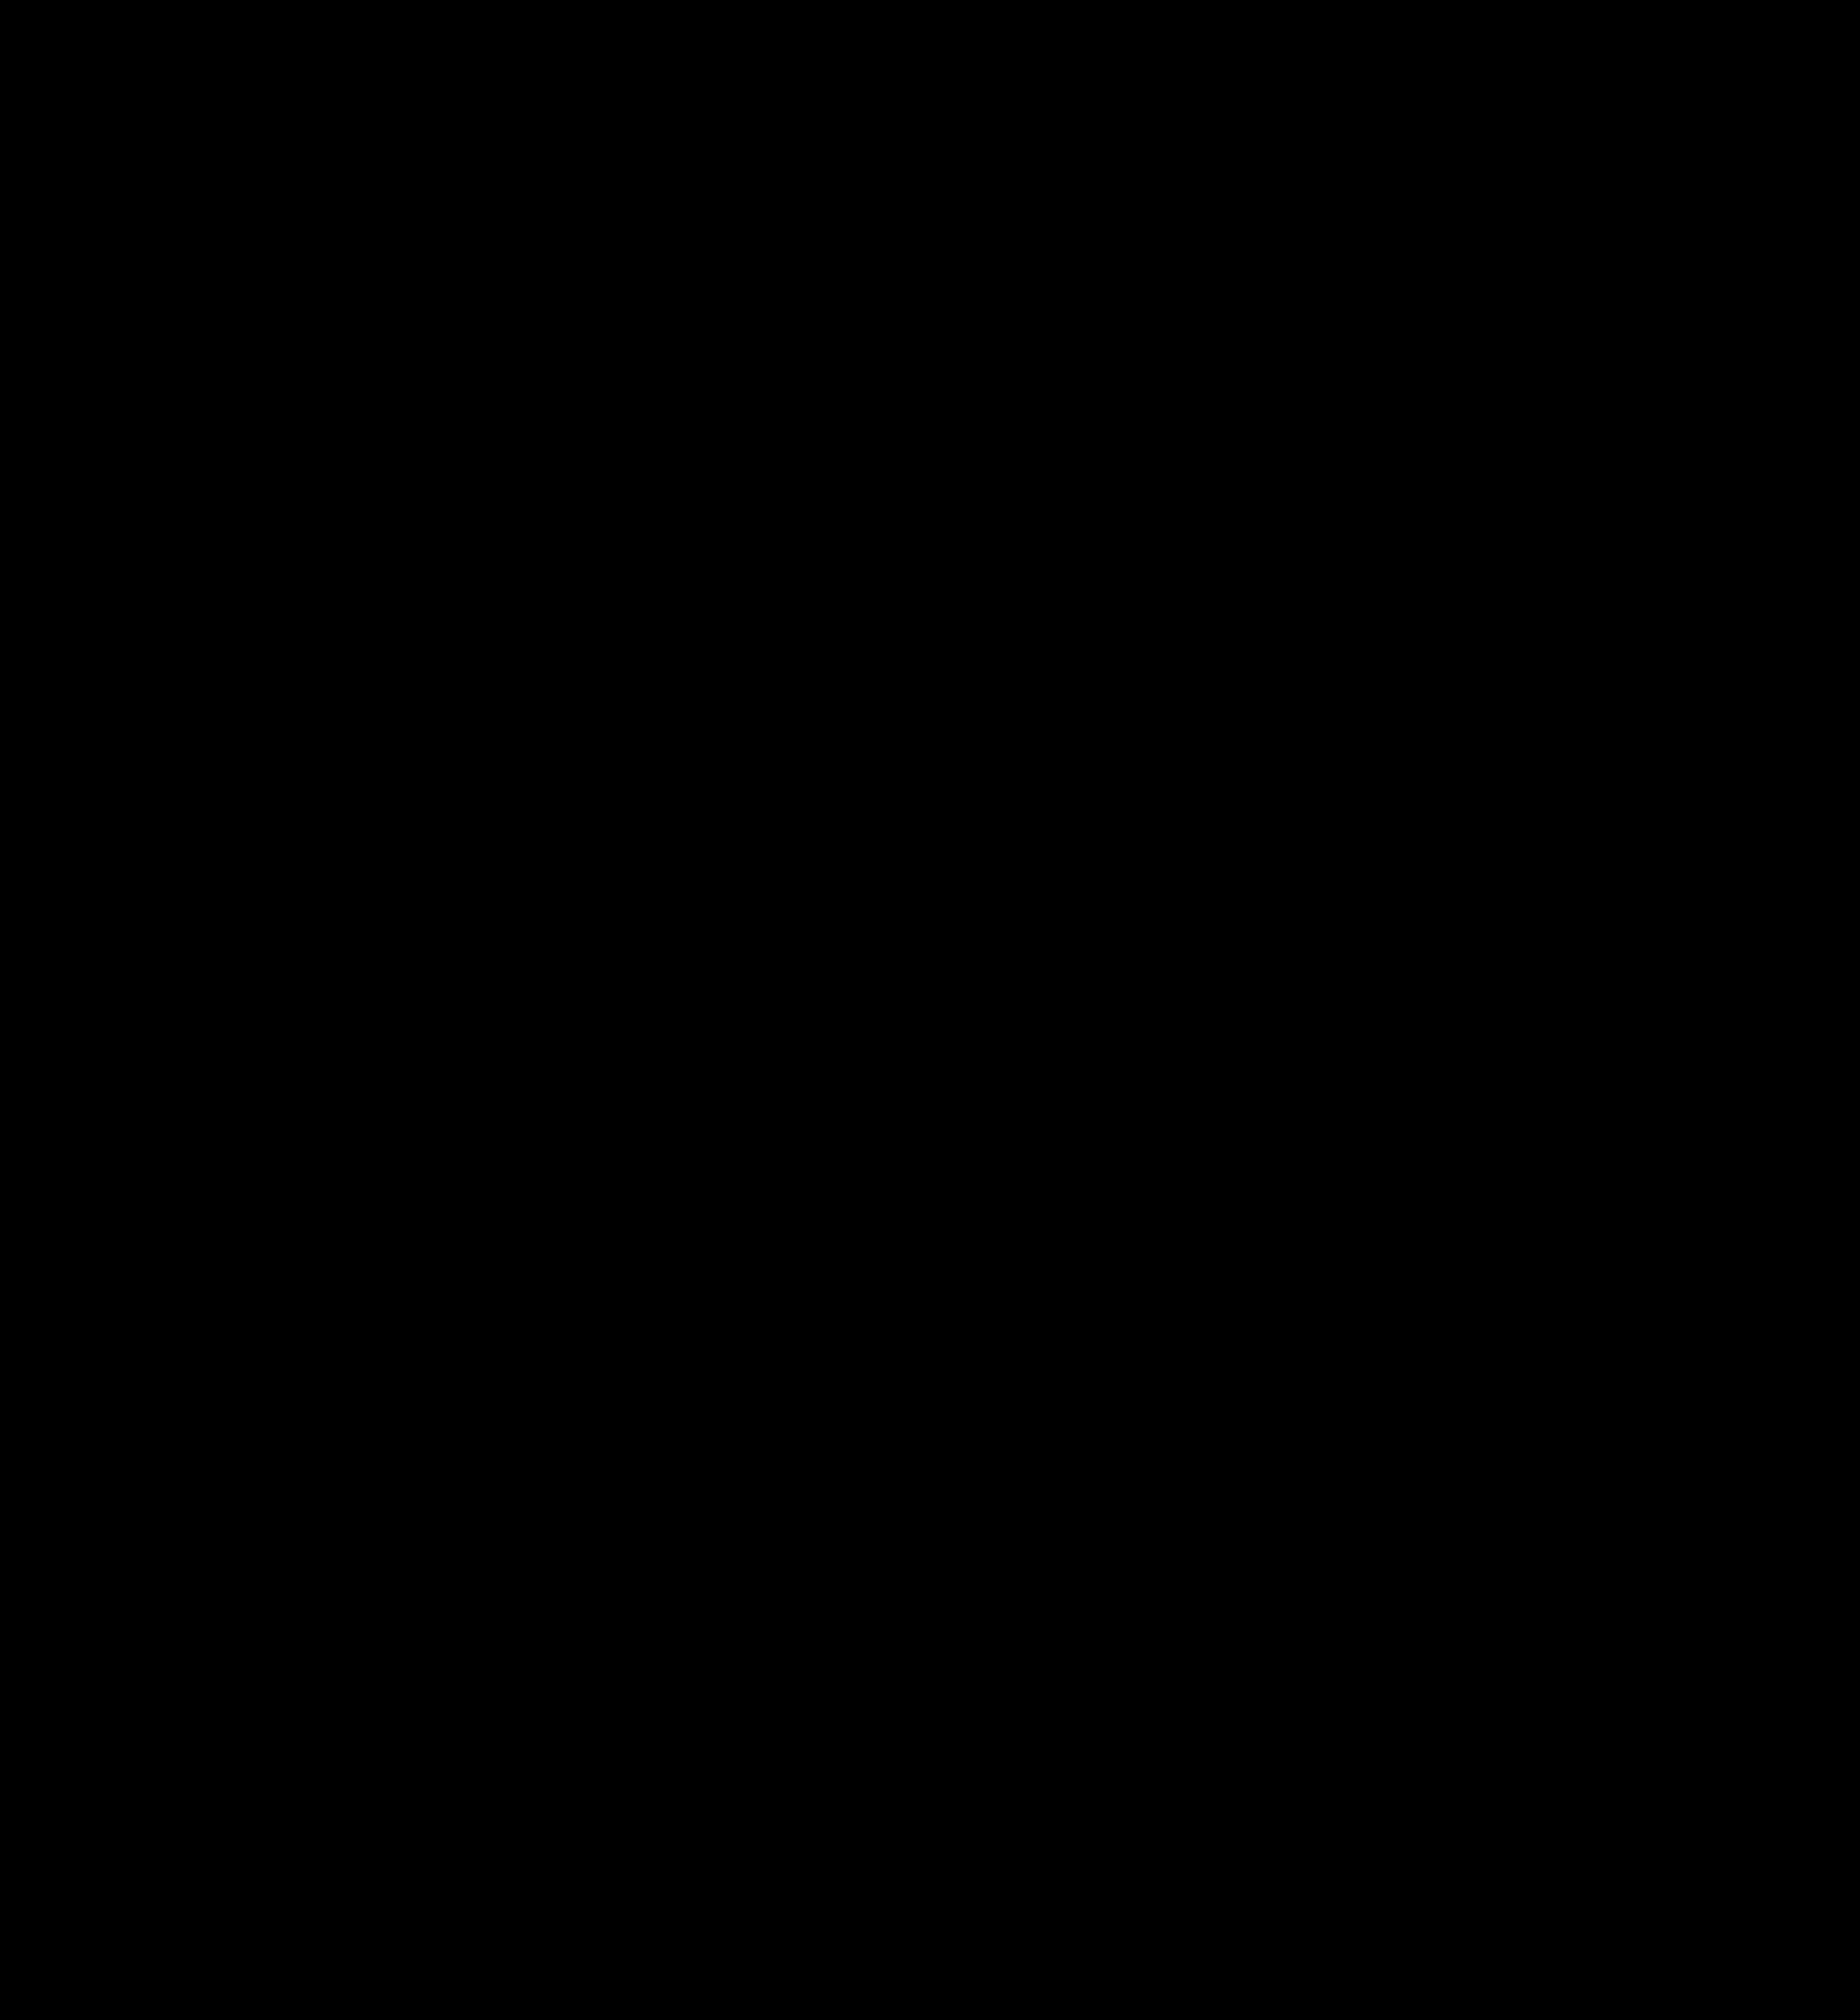 2116x2308 Clipart